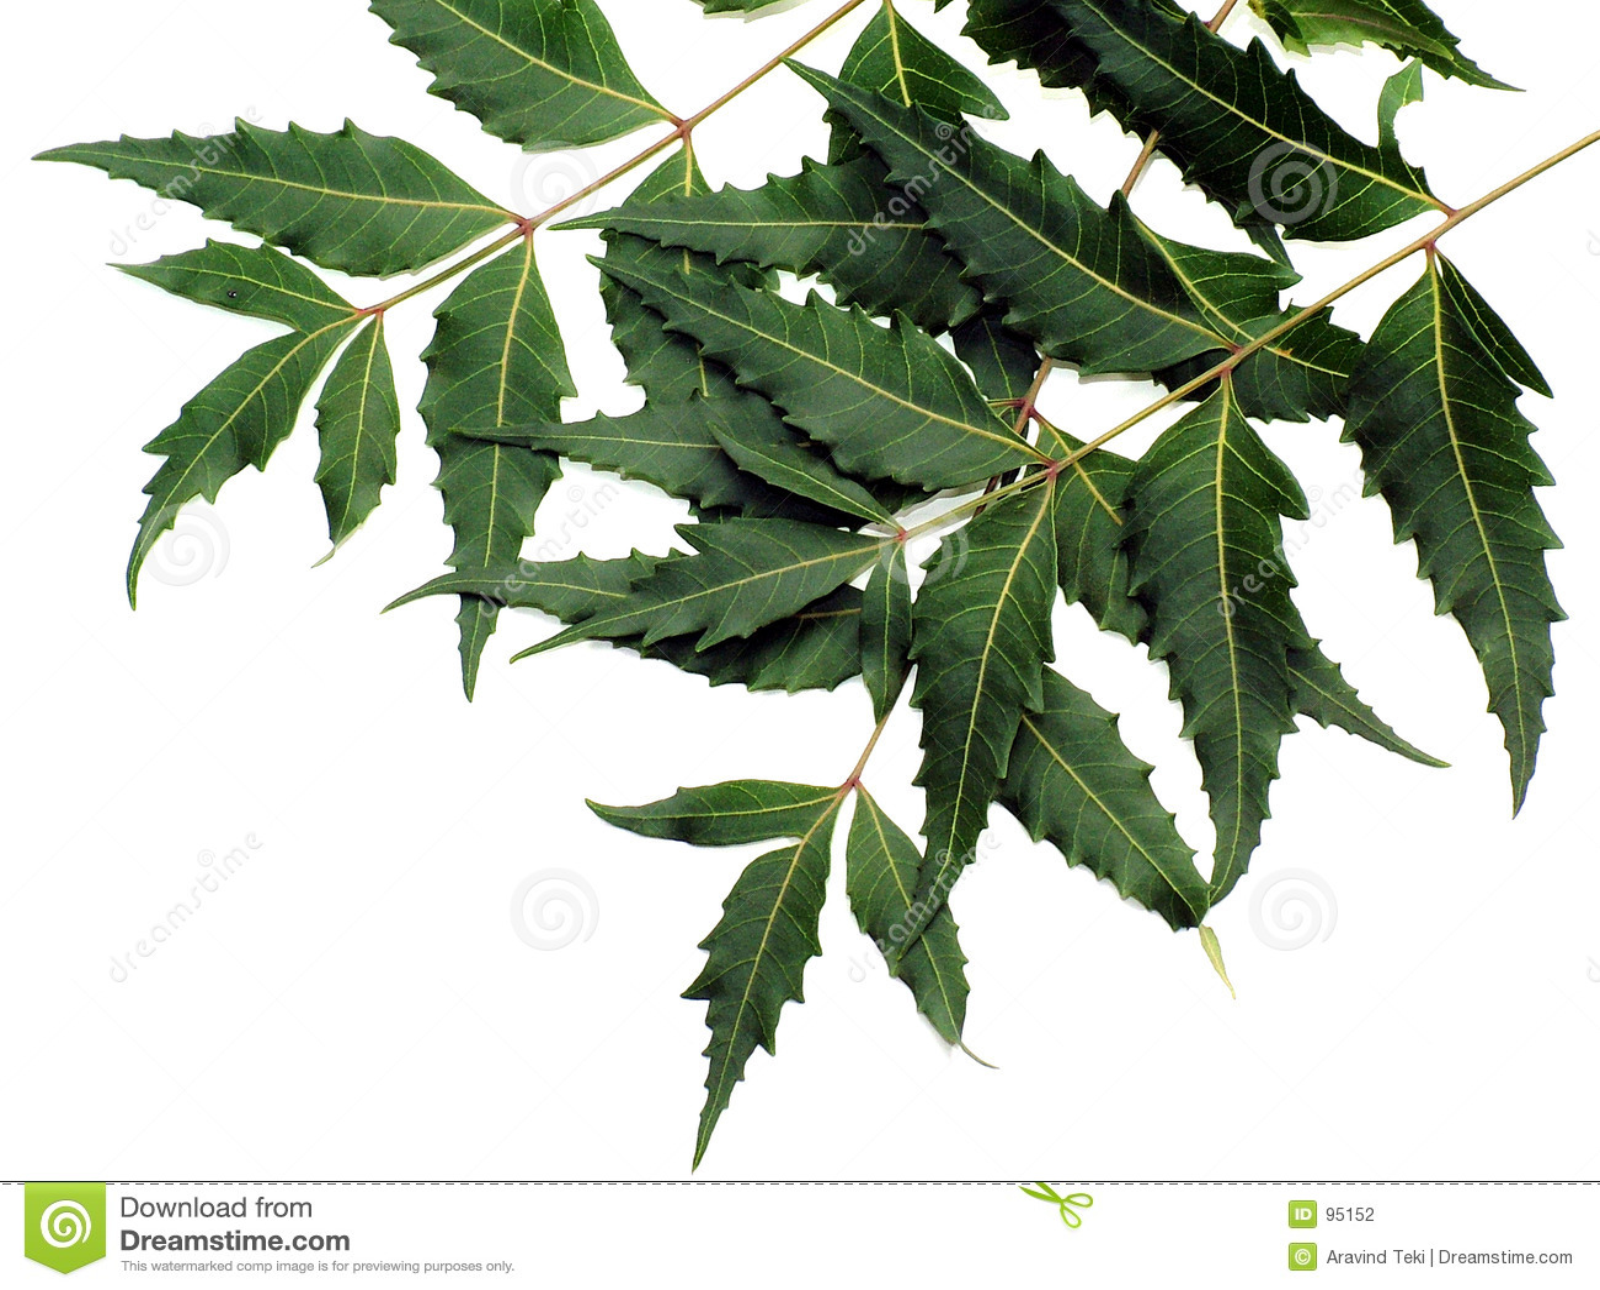 Neem Tree Clipart